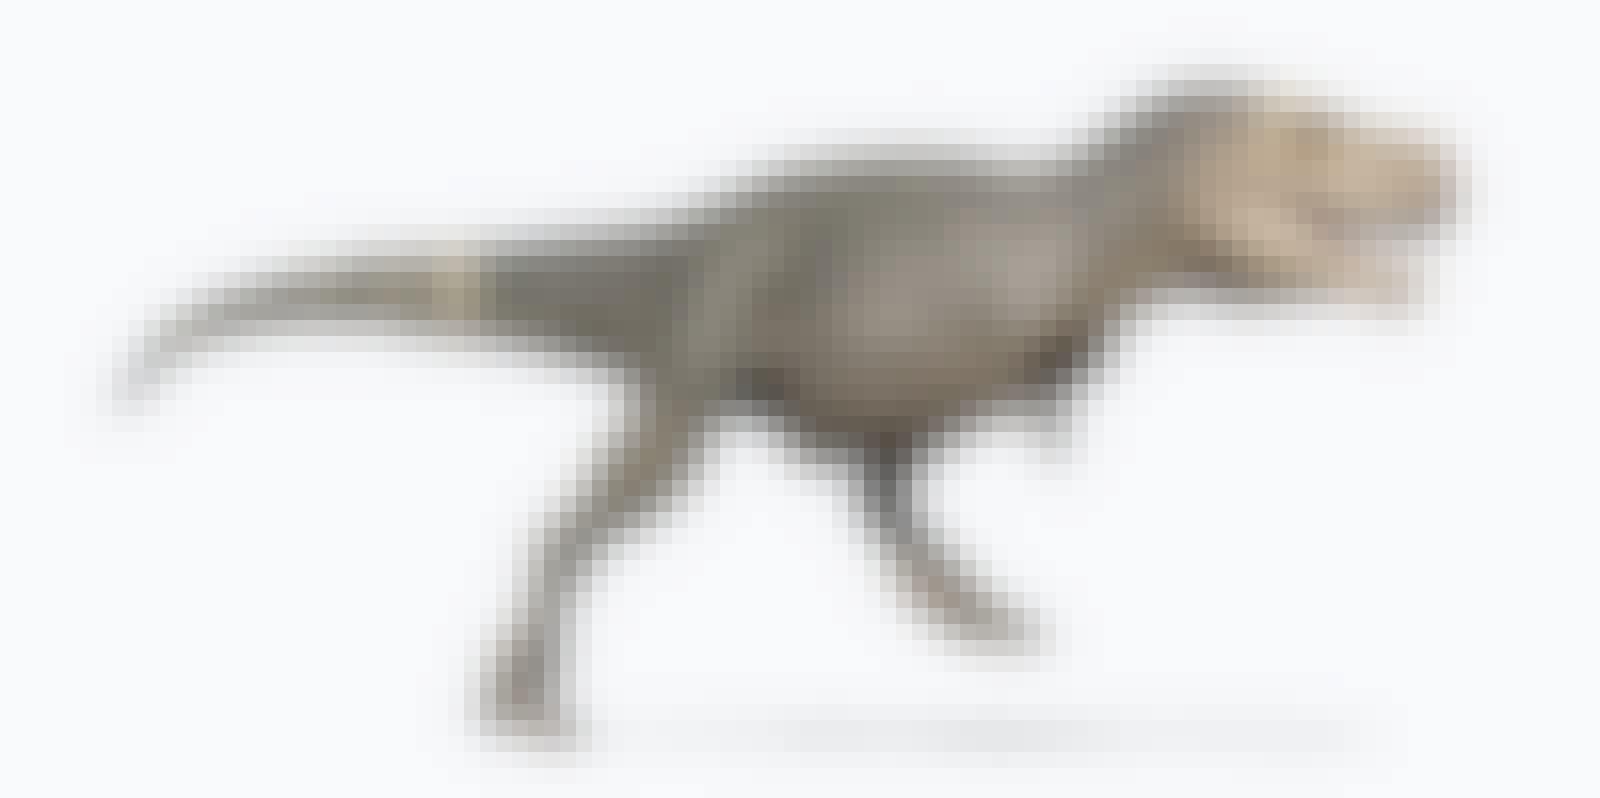 Tyrannosaurus rex springer